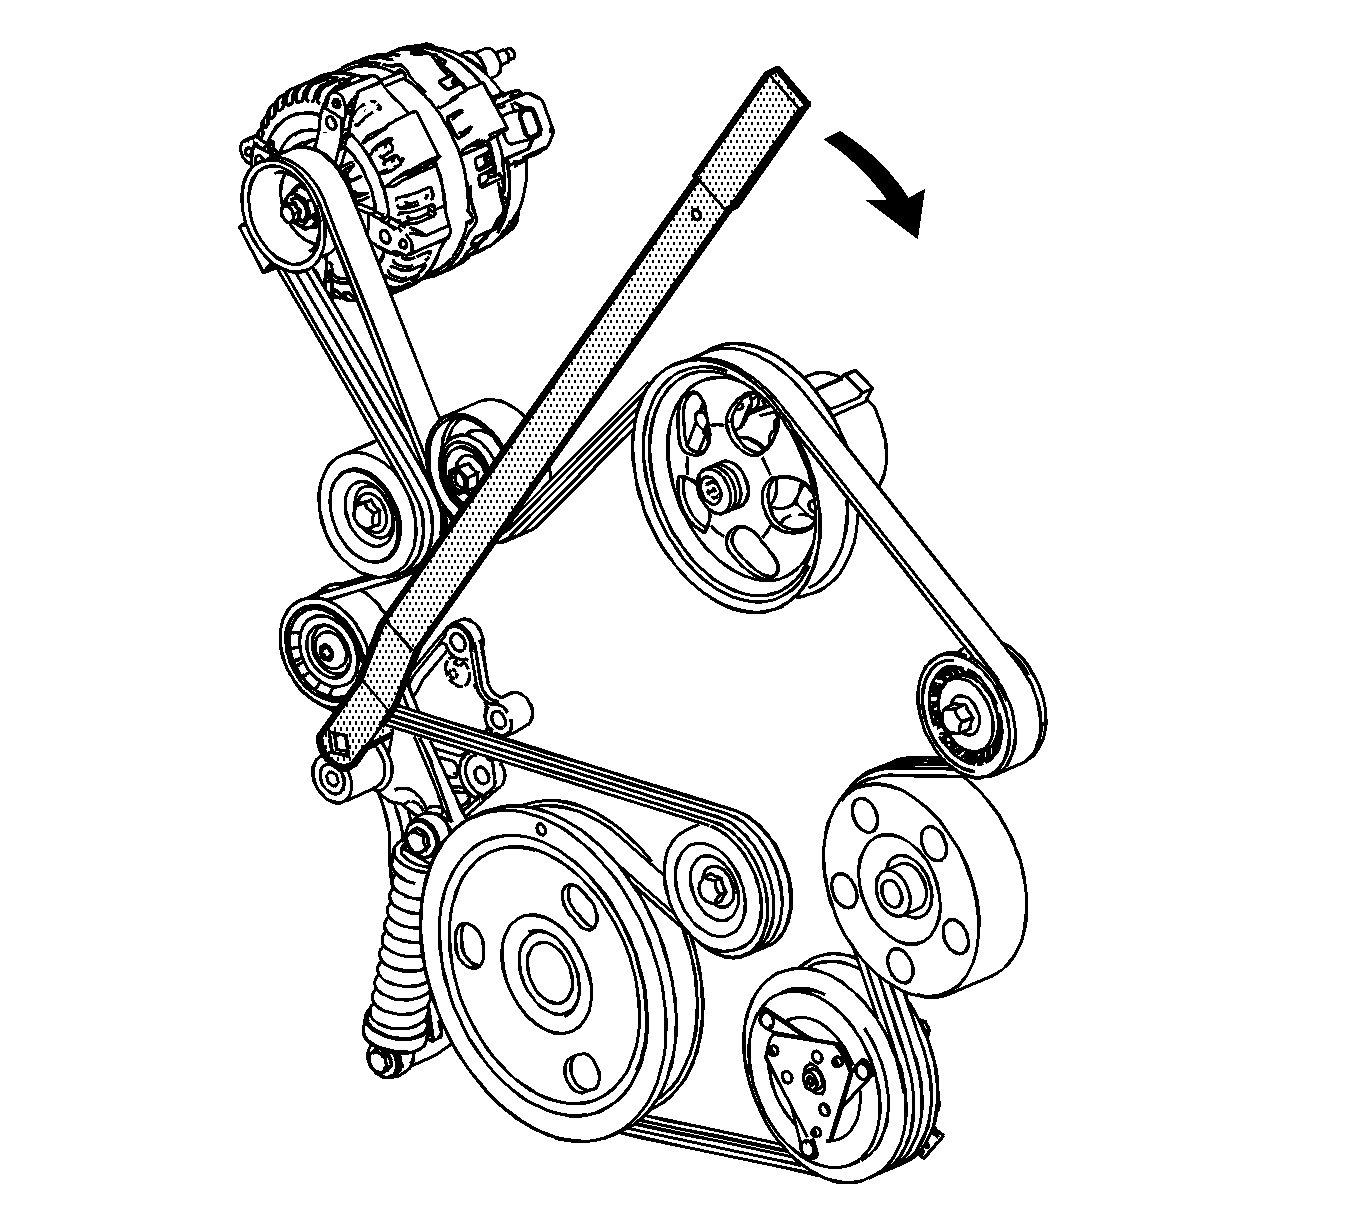 2004 grand prix gtp serpentine belt diagram Honda CR-V Fuse Location